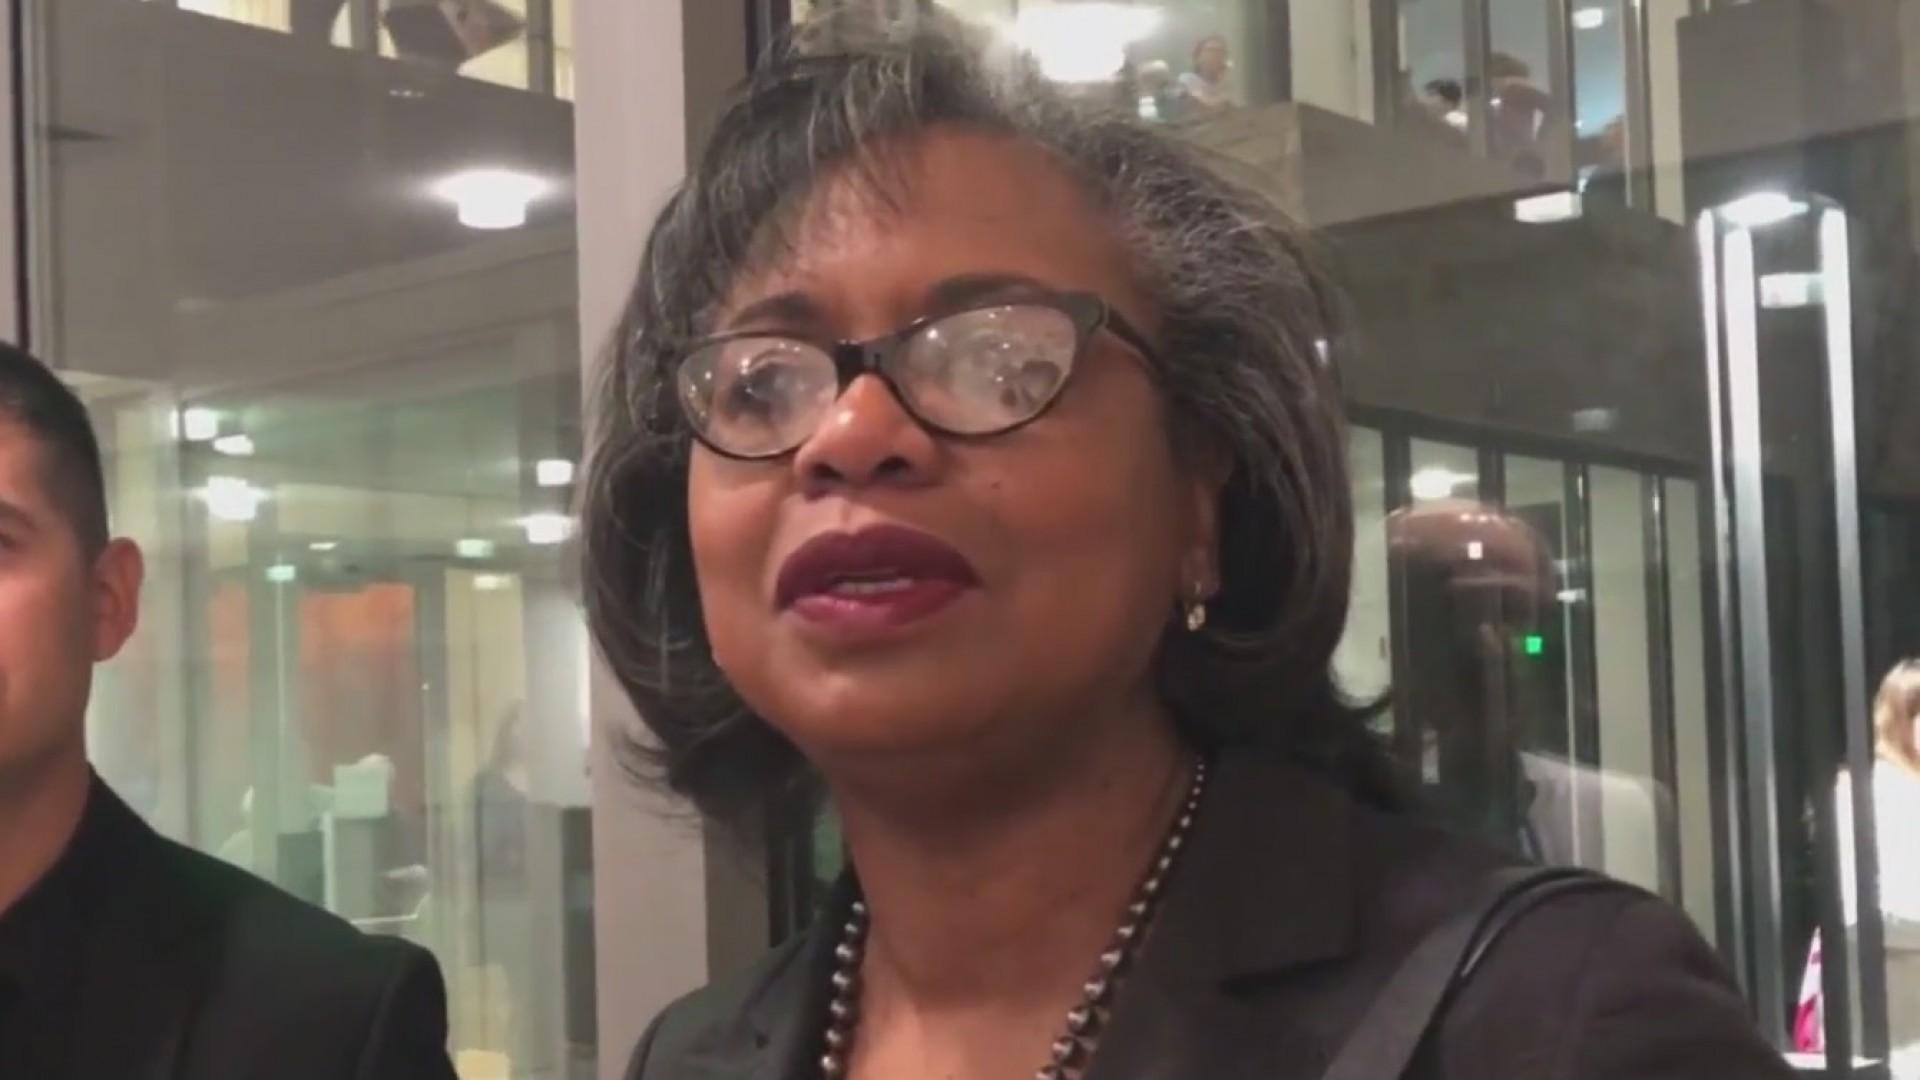 Anita_Hill_speaks_at_the_U_Wednesday_nig_0_20180927043456